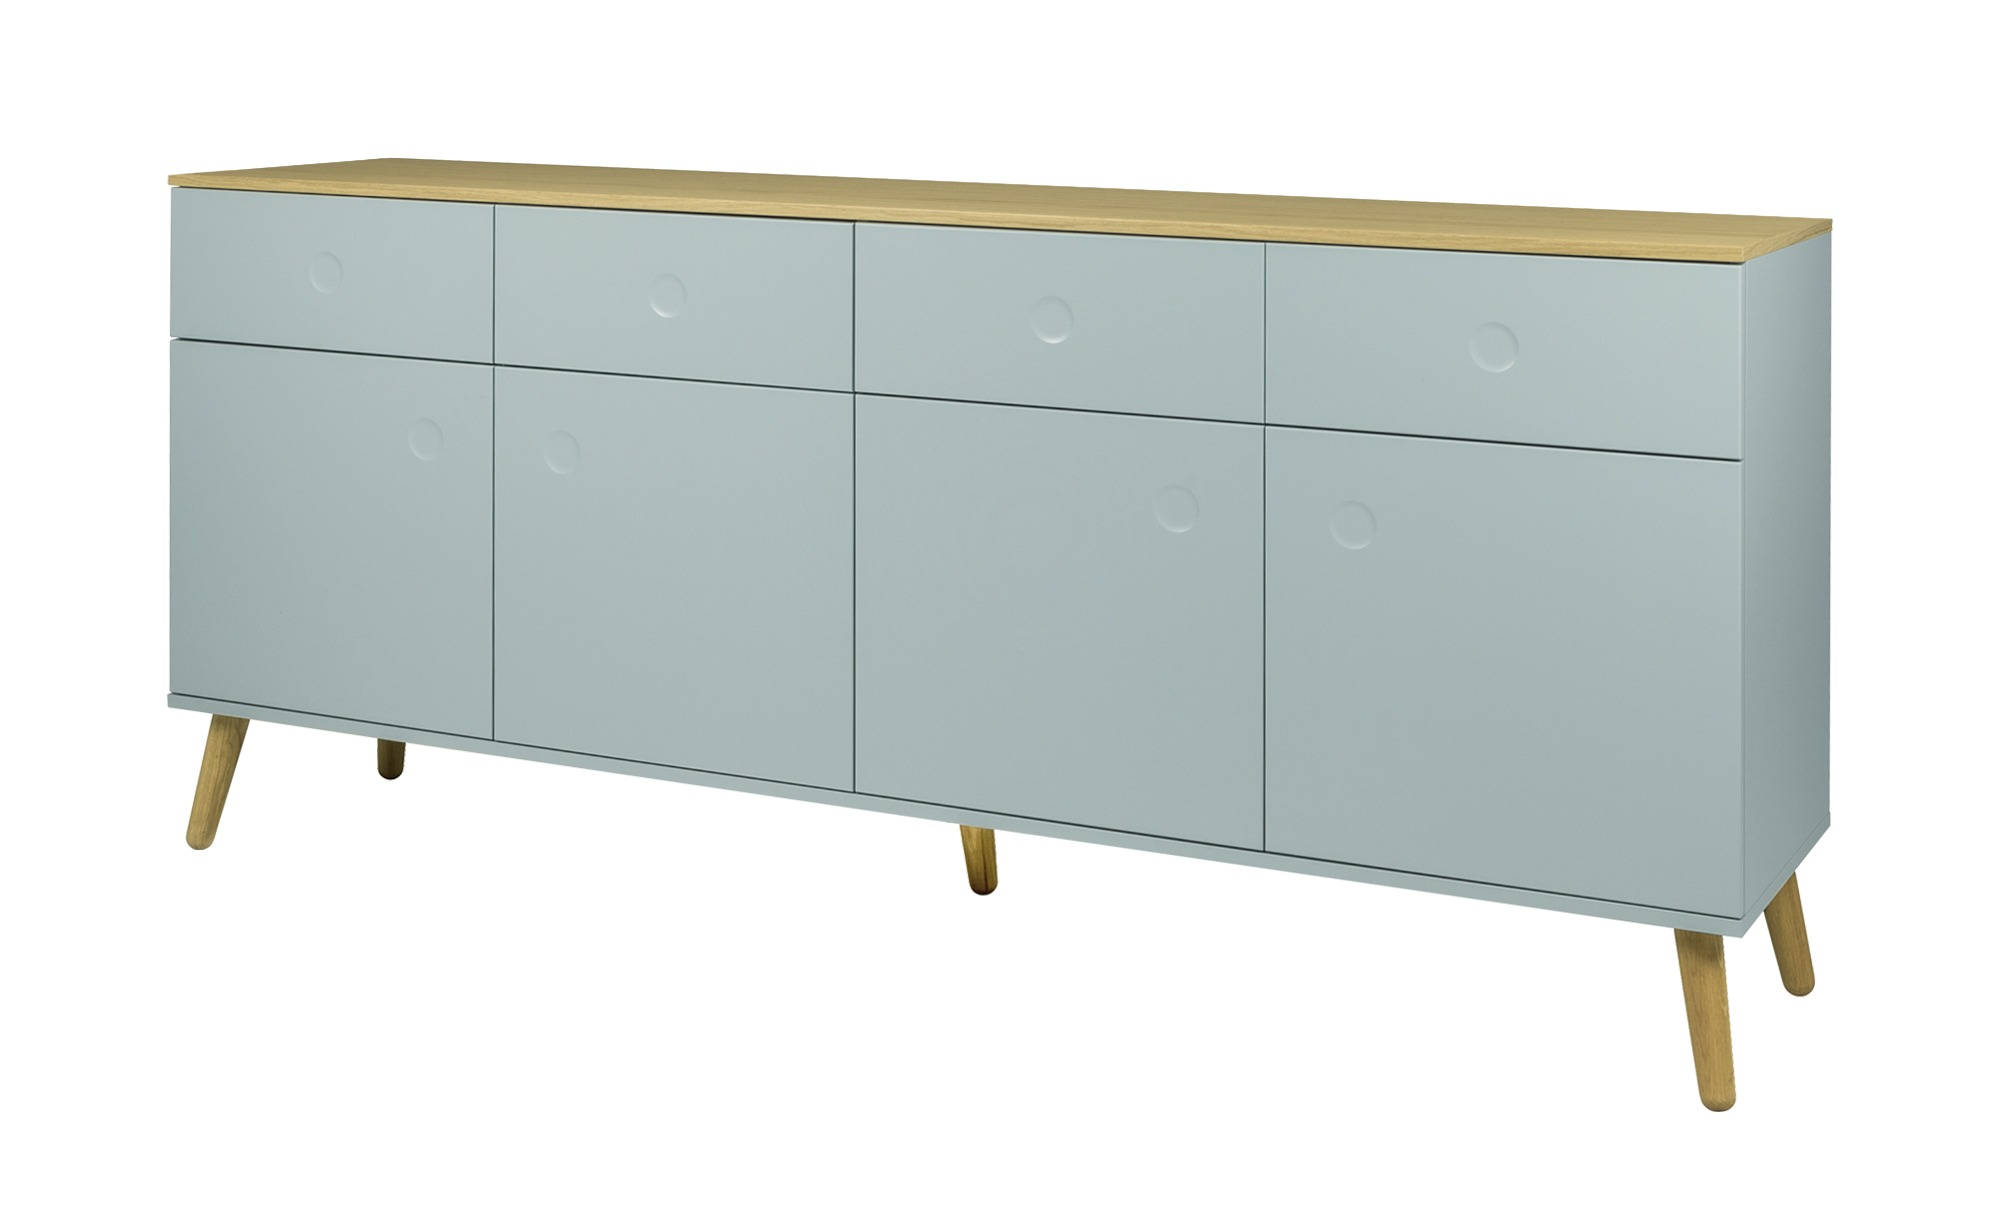 roomers sideboard scan breite 192 cm h he 86 cm online kaufen bei woonio. Black Bedroom Furniture Sets. Home Design Ideas